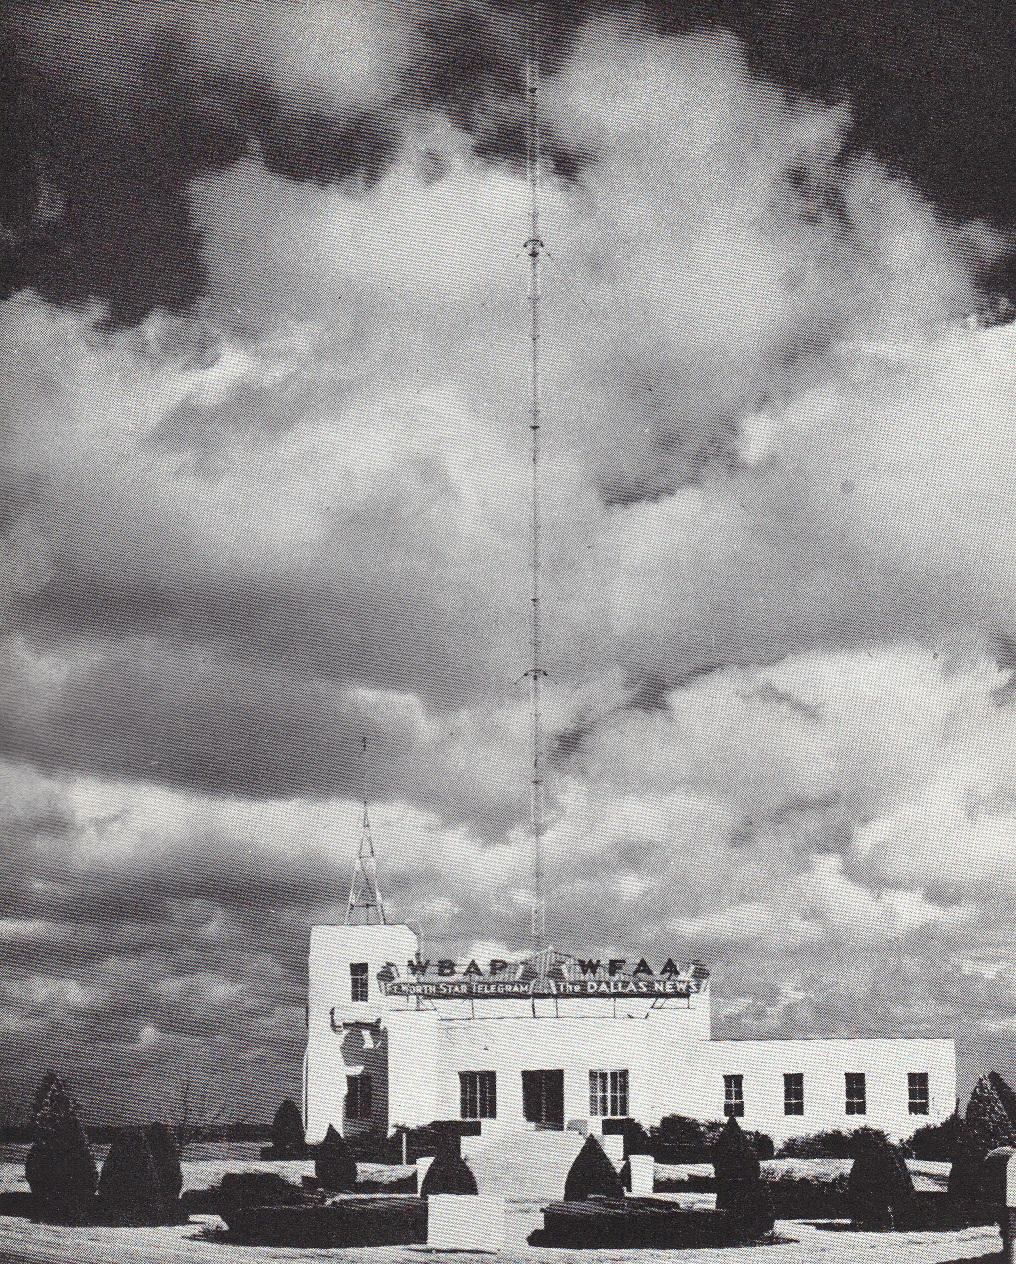 WFAA & WBAP's Unusual Broadcasting Alliance | Flashback : Dallas